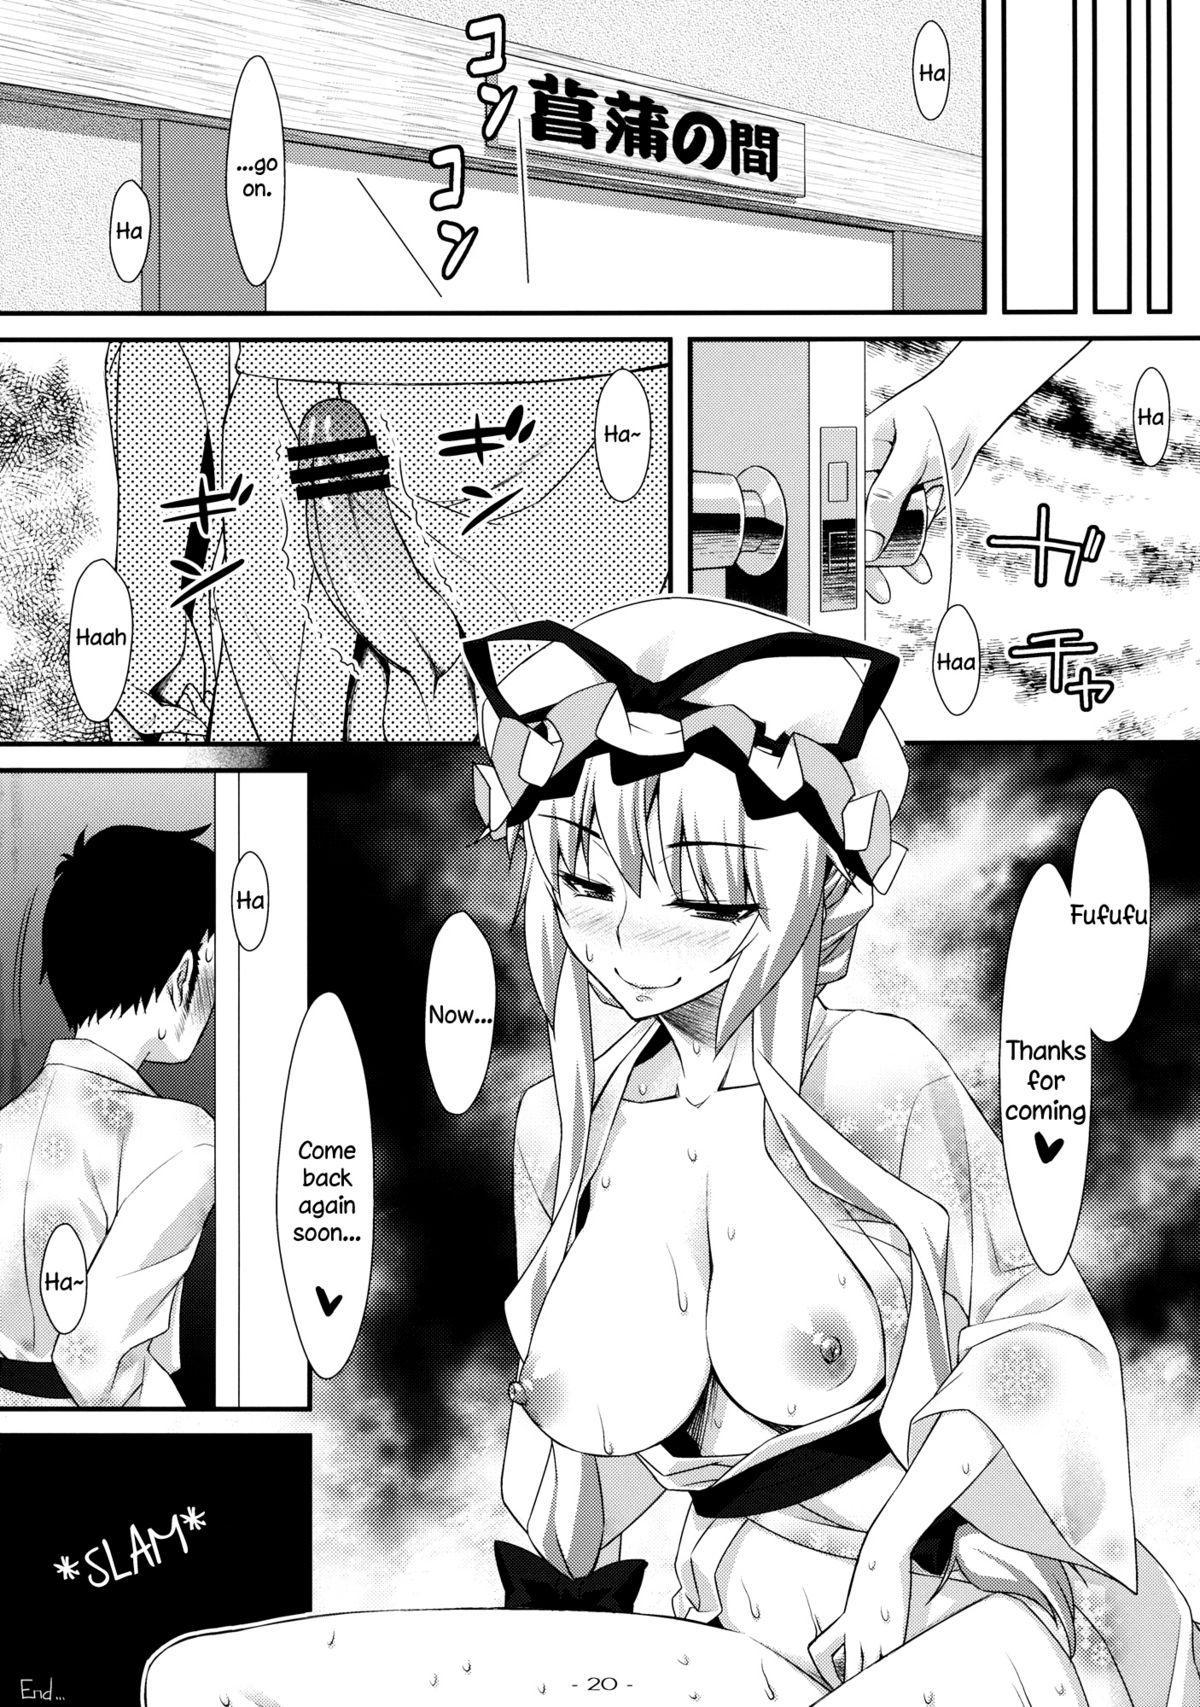 Yasei no Chijo ga Arawareta! 4   A Wild Nymphomaniac Appeared! 4 19